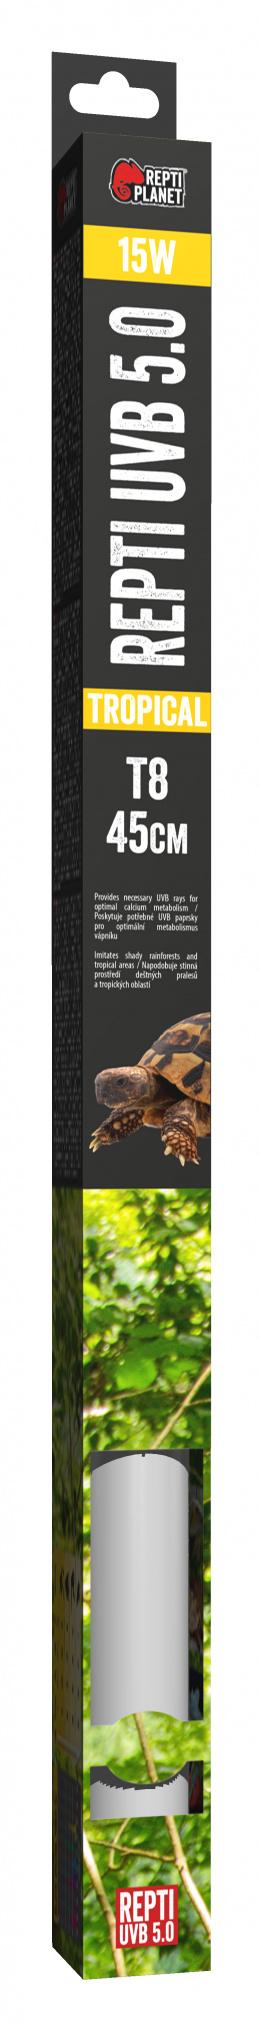 Spuldze terārija lampai - ReptiPlanet Repti T8 UVB 5.0 15W, 45 cm